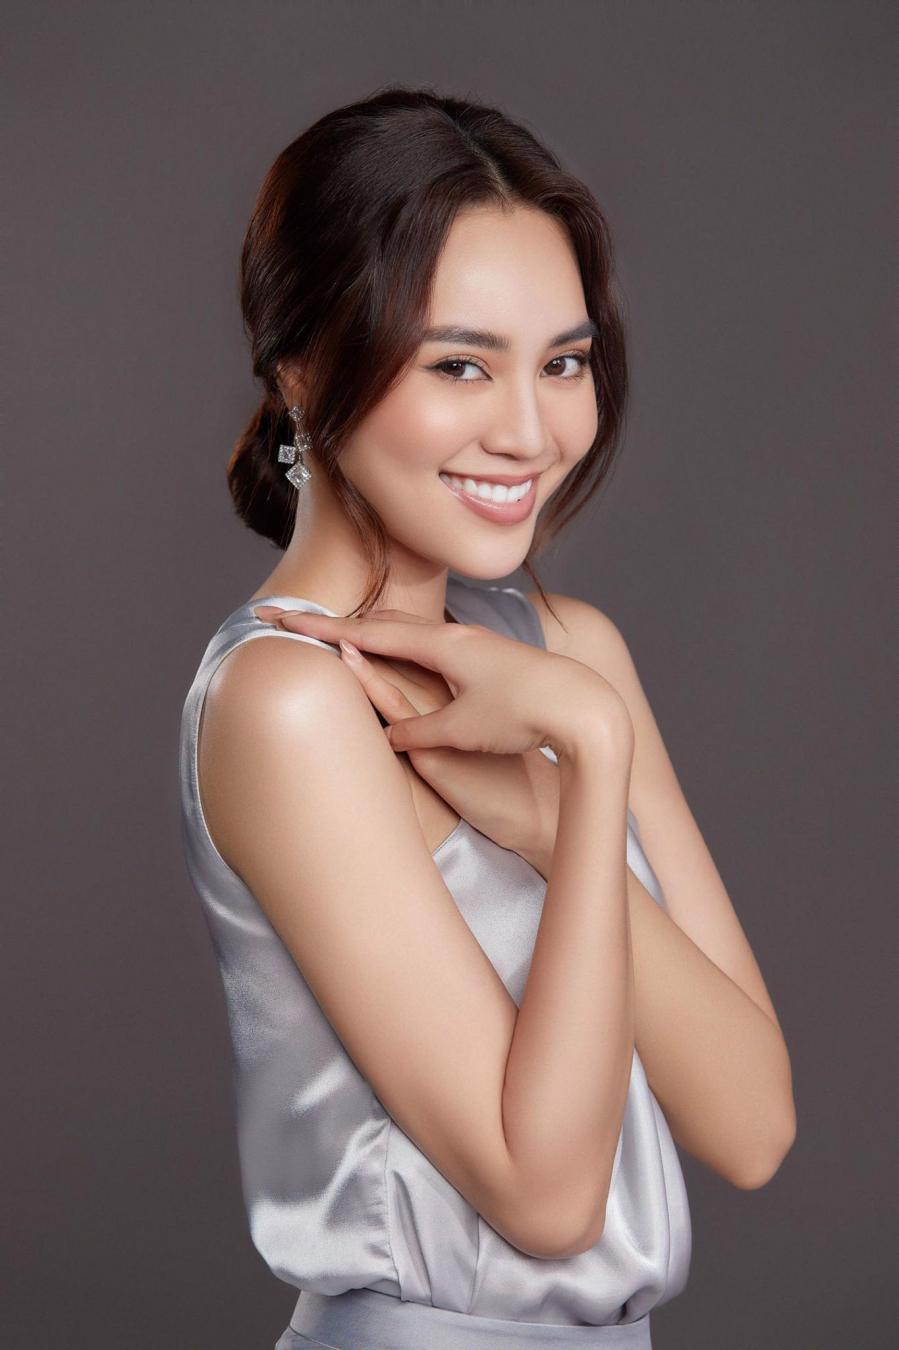 teaser-ninh-duong-lan-ngoc_a1639301a16a41c79ff18b5689773625